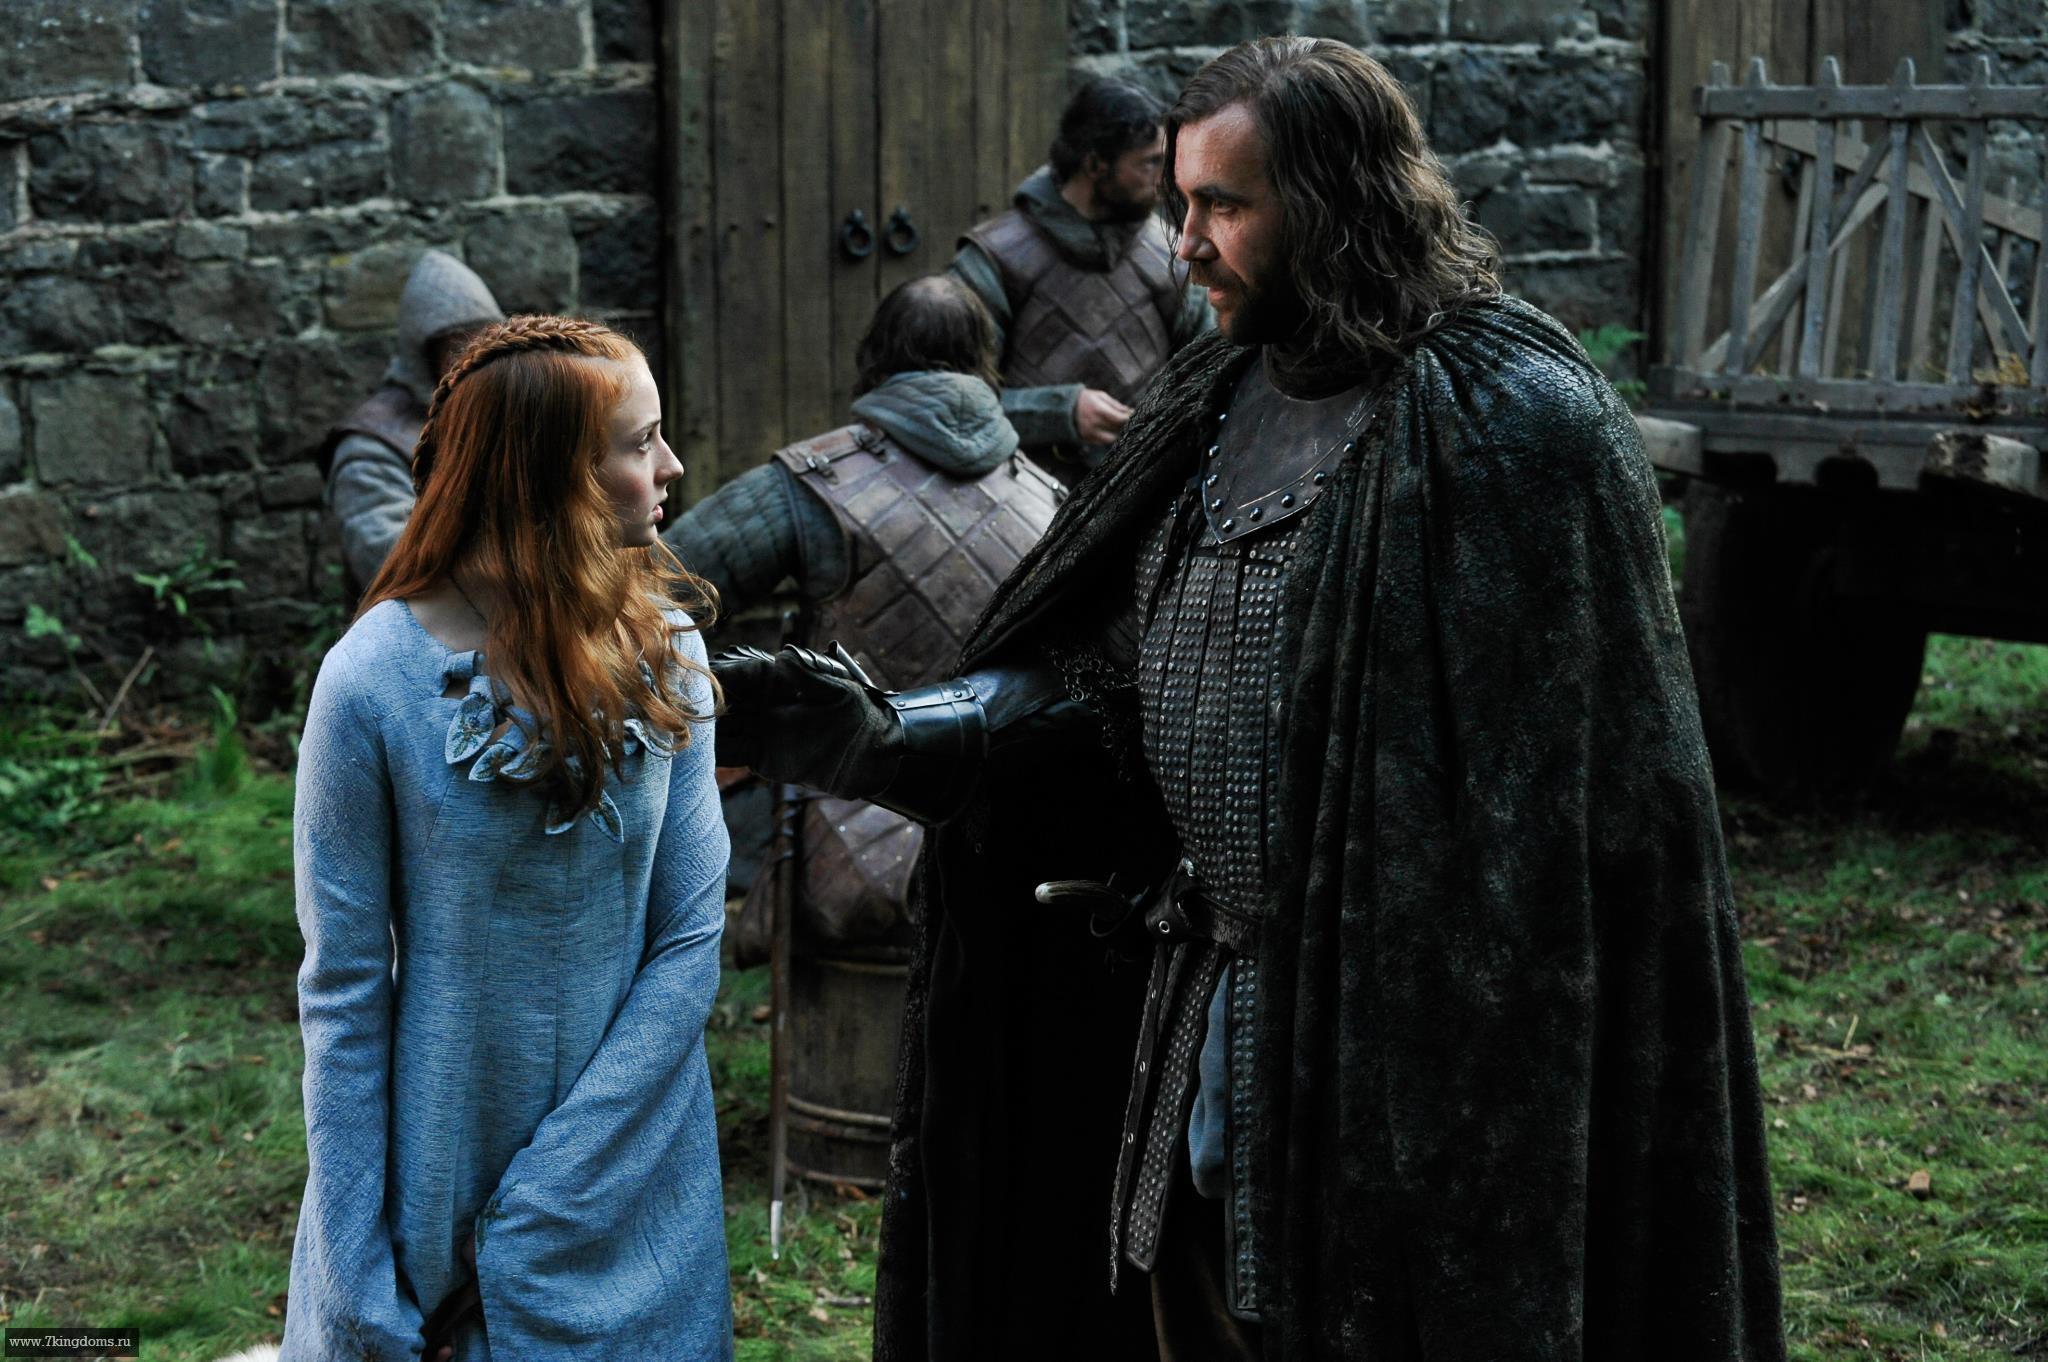 Sansa & Sandor - Game of Thrones Photo (25314482) - Fanpop